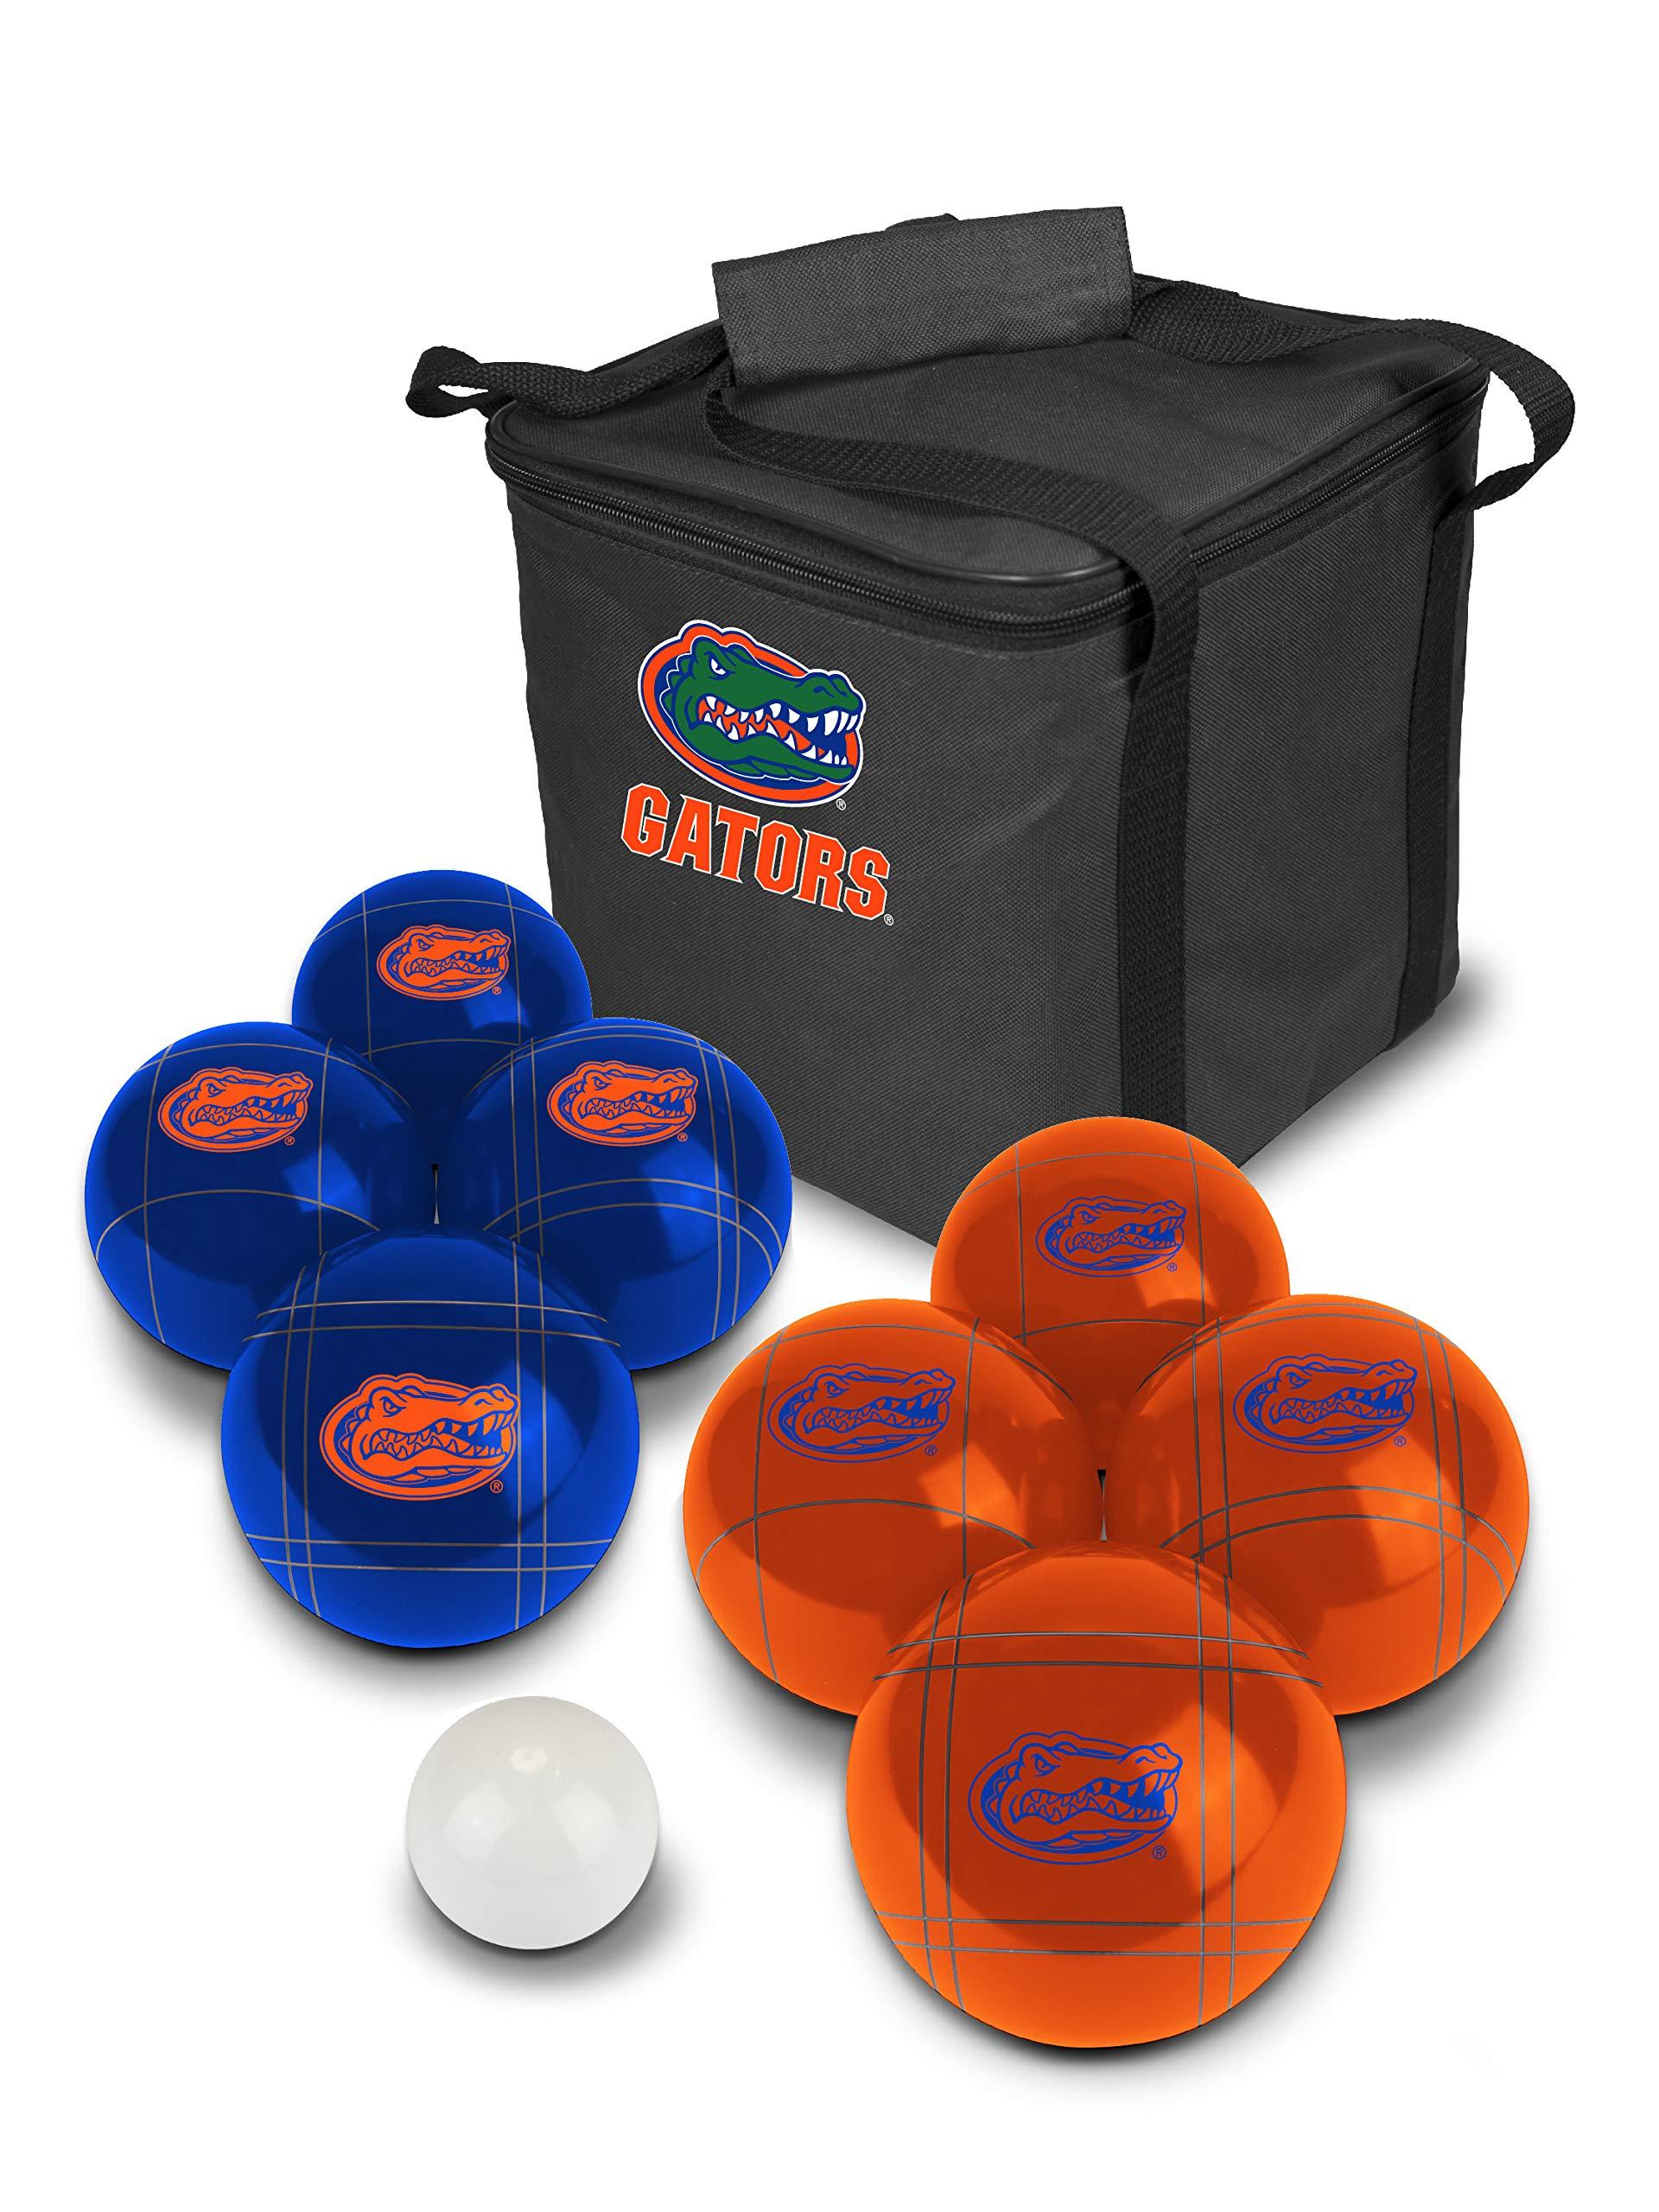 PROLINE NCAA College Florida Gators Bocce Ball Set by PROLINE (Image #1)